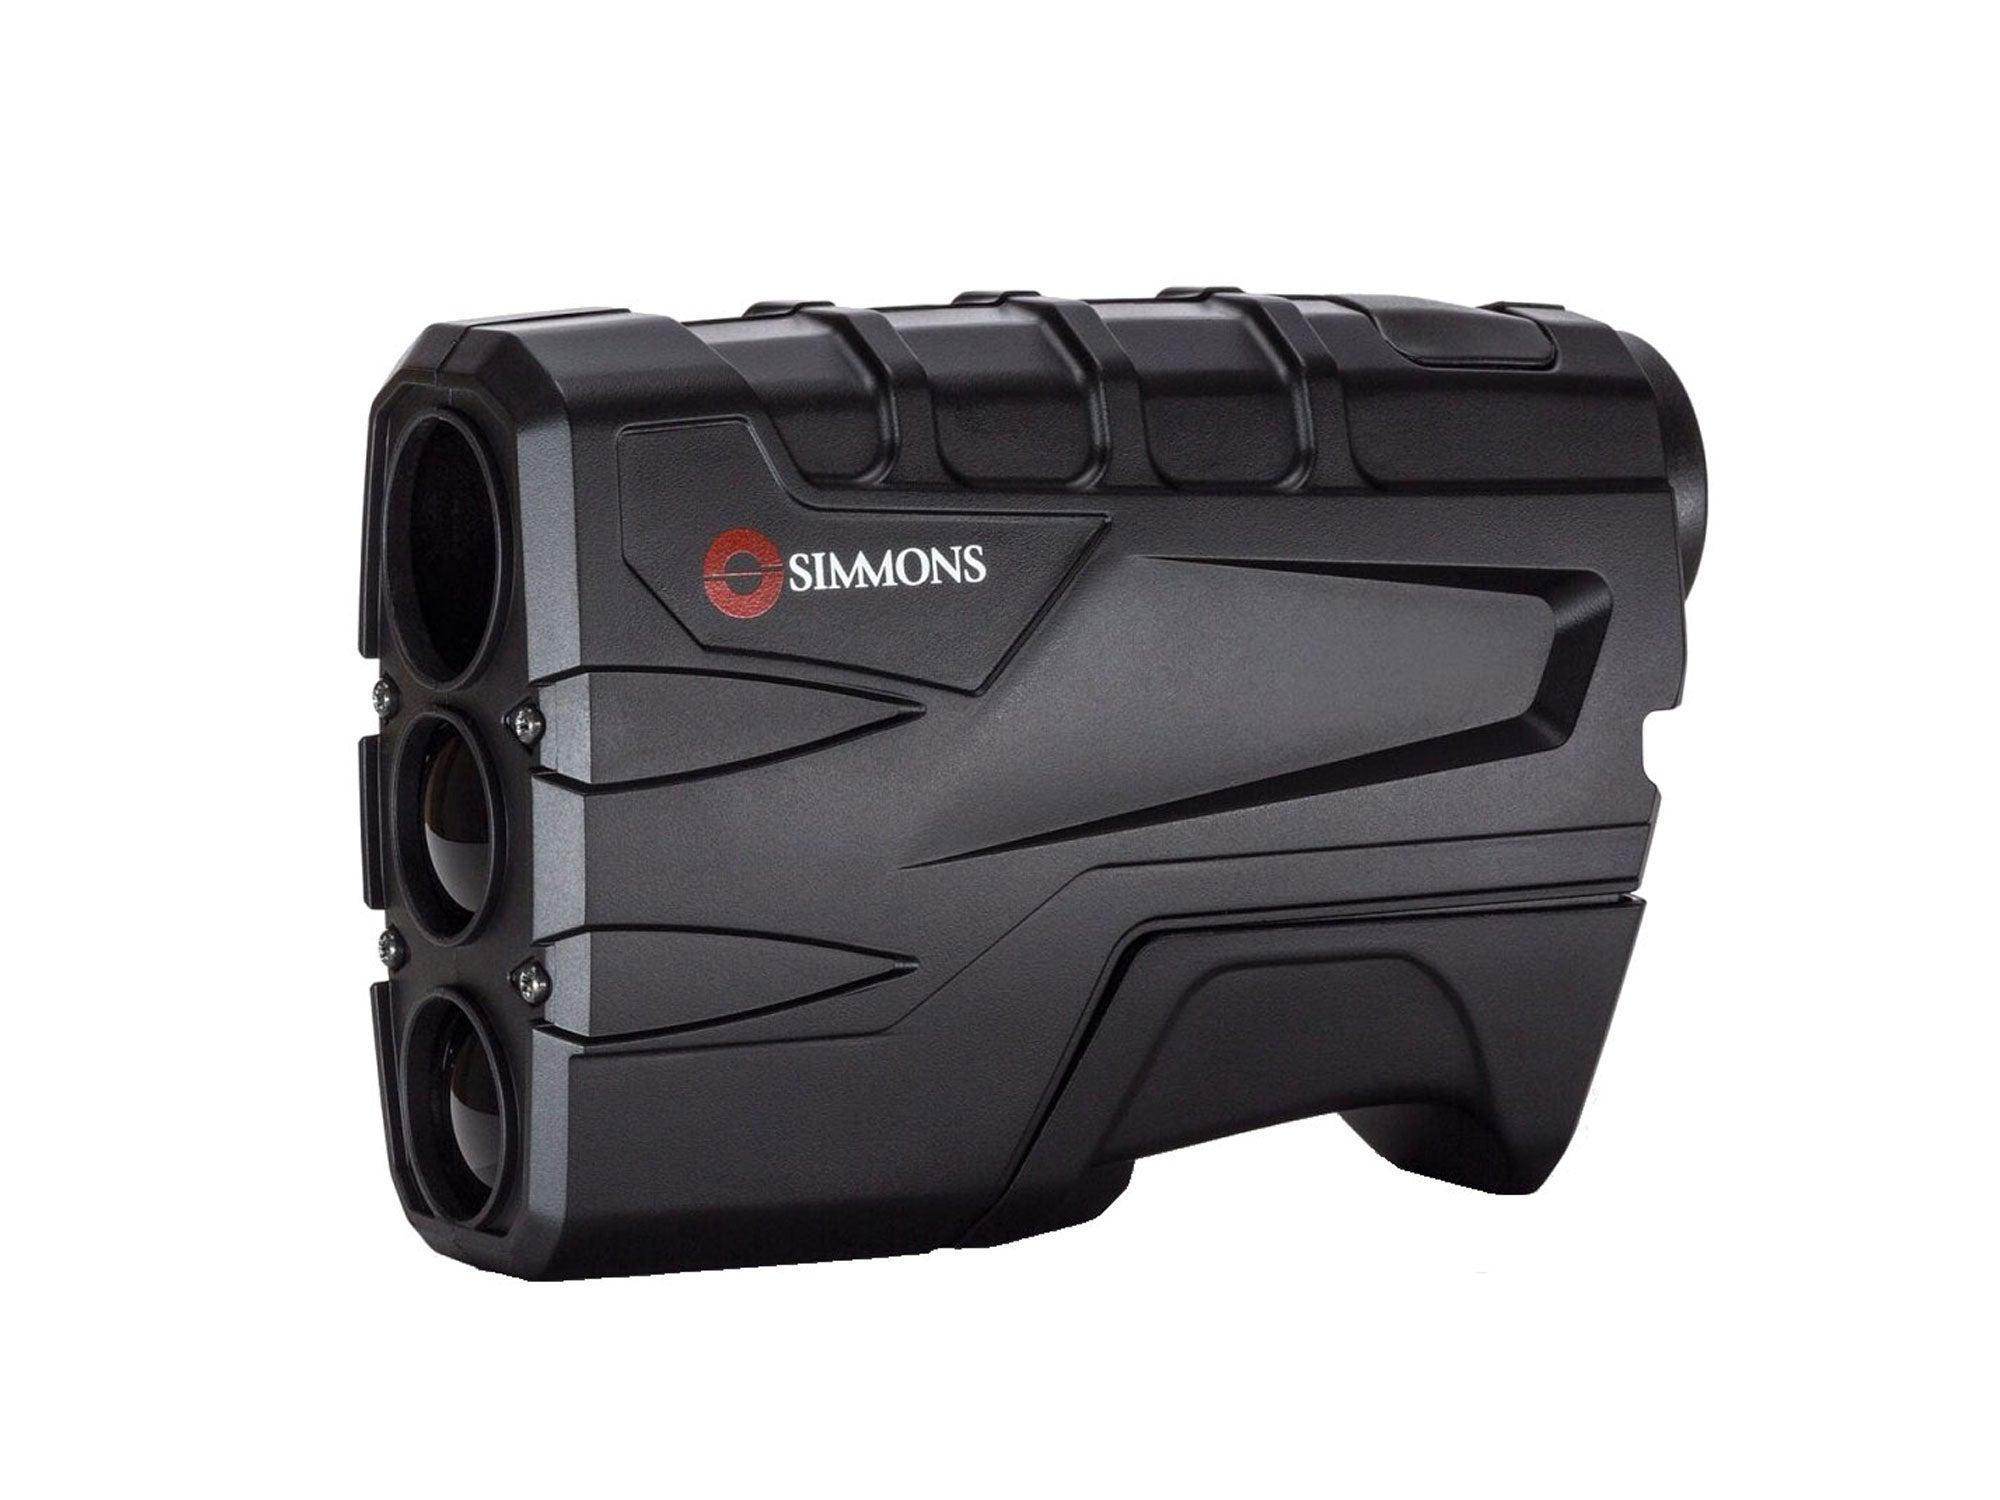 Simmons rangefinder